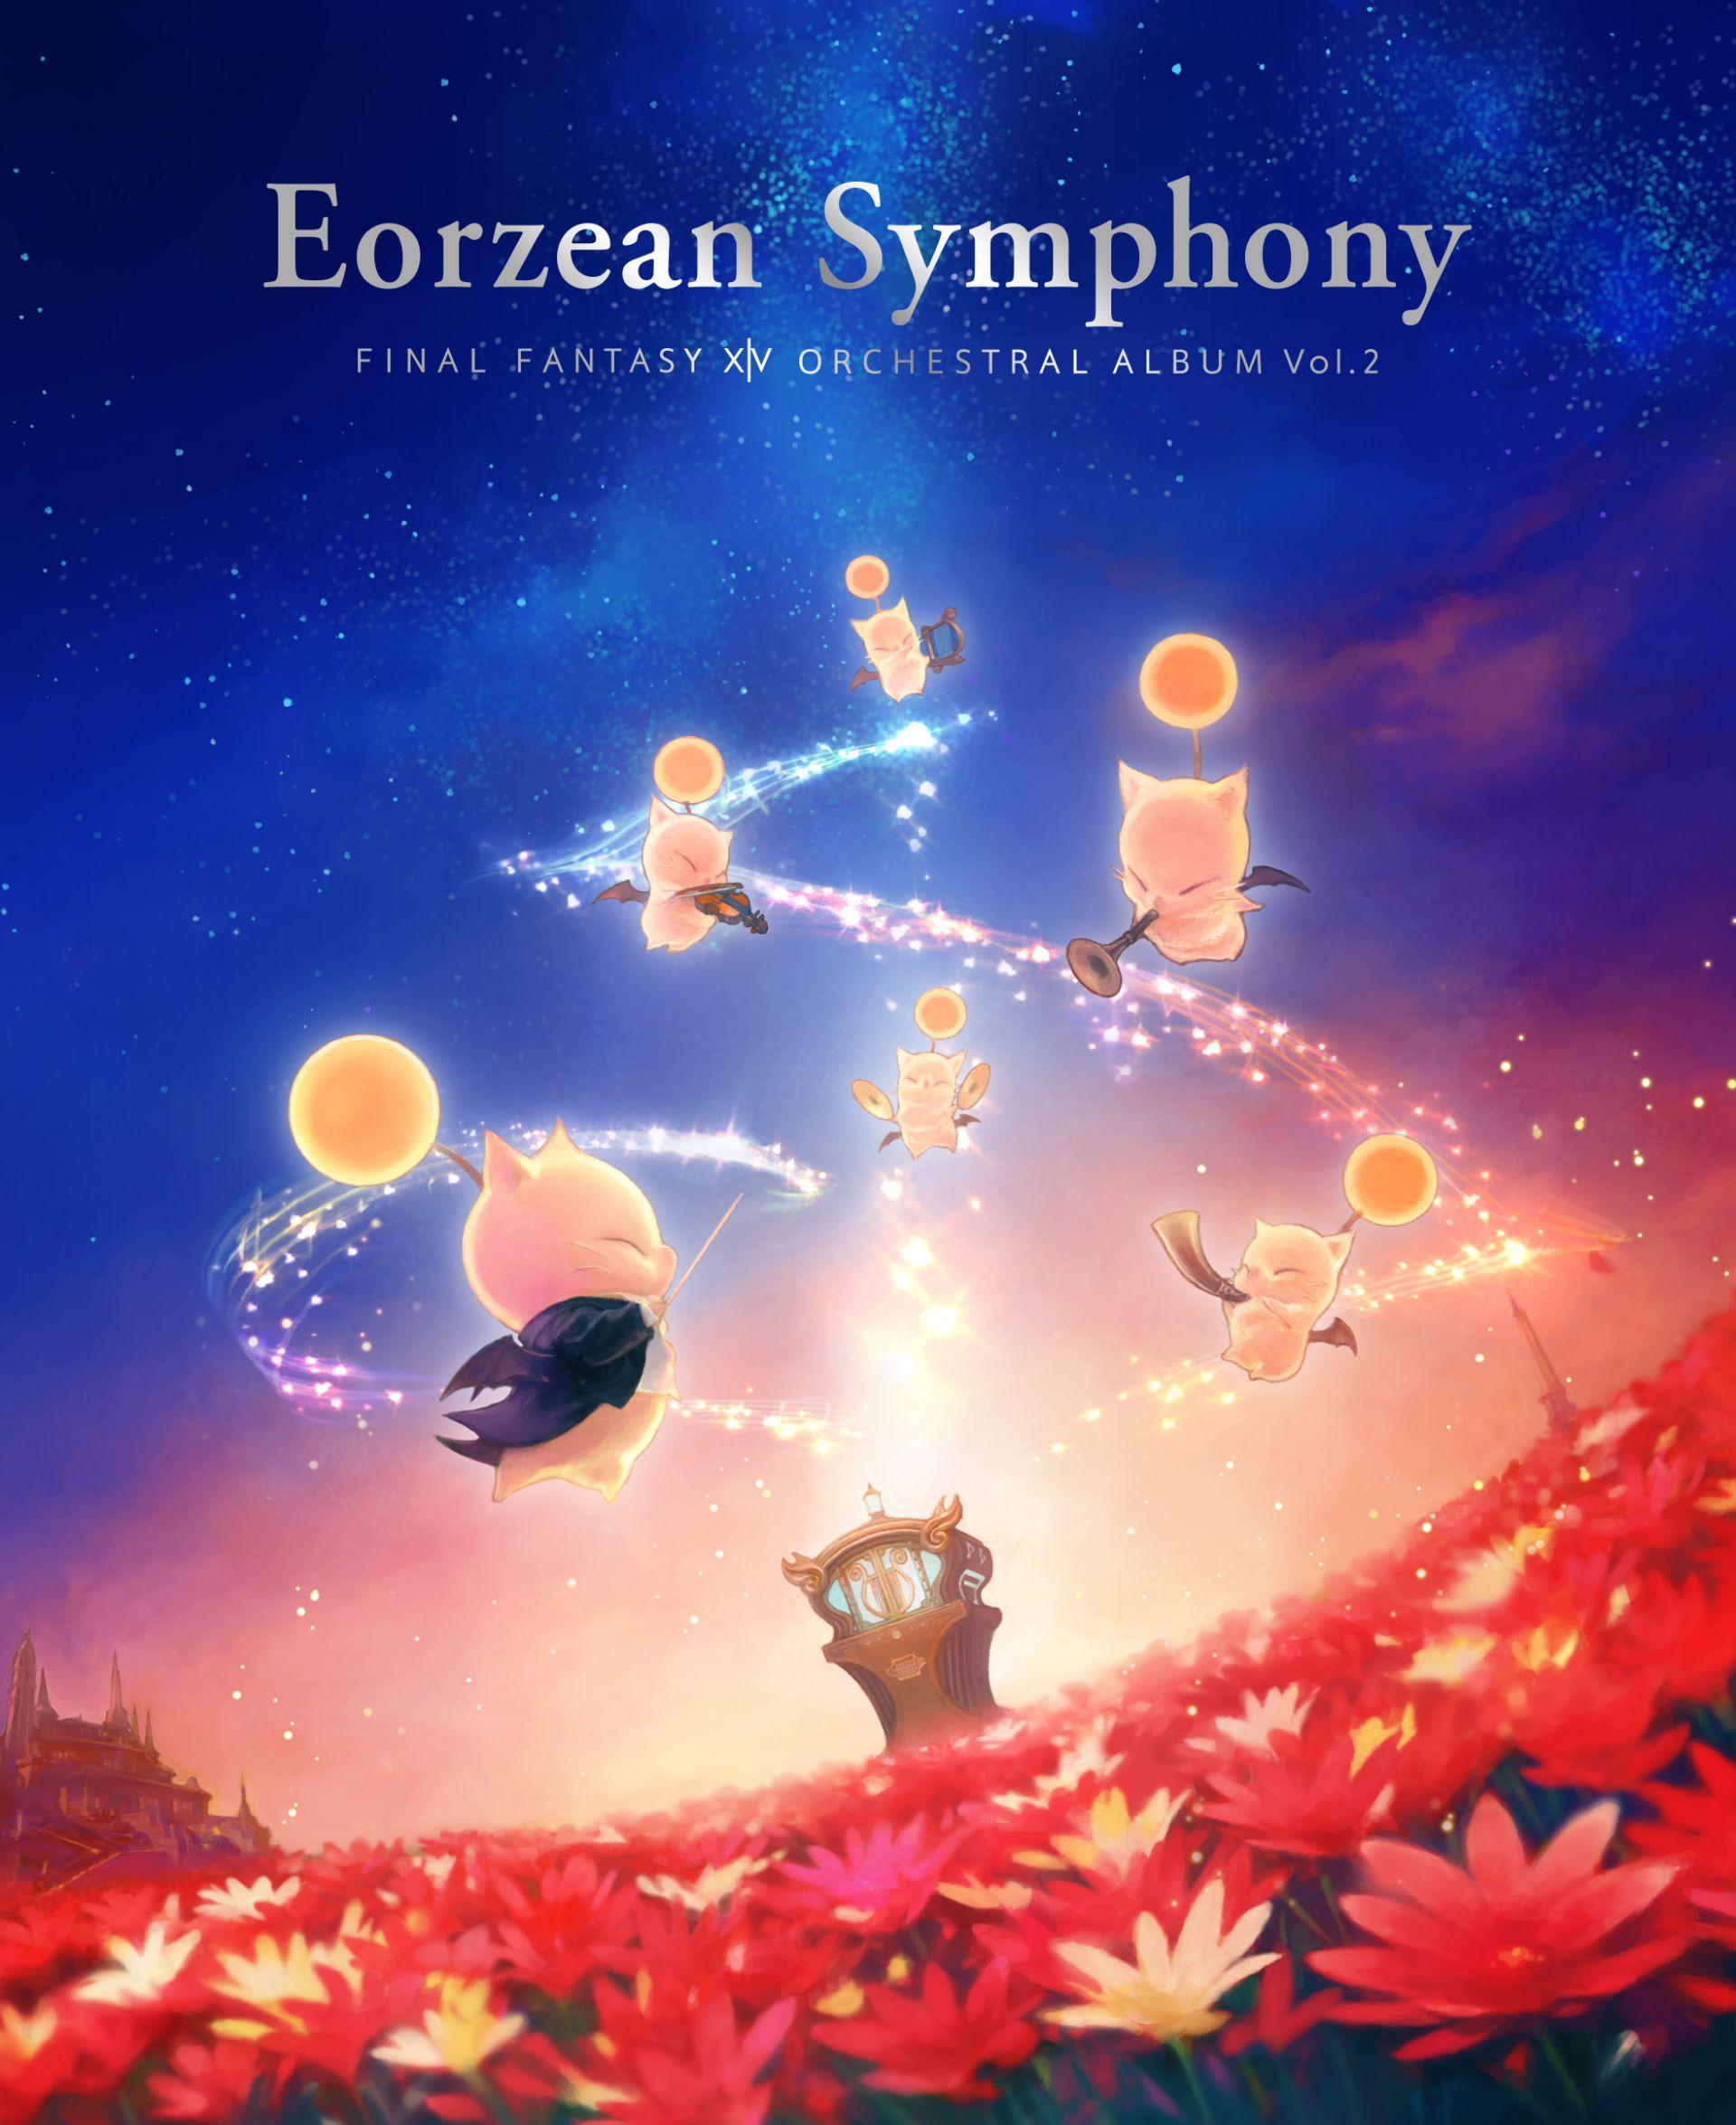 EORZEAN SYMPHONY: FINAL FANTASY® XIV ORCHESTRAL ALBUM Vol